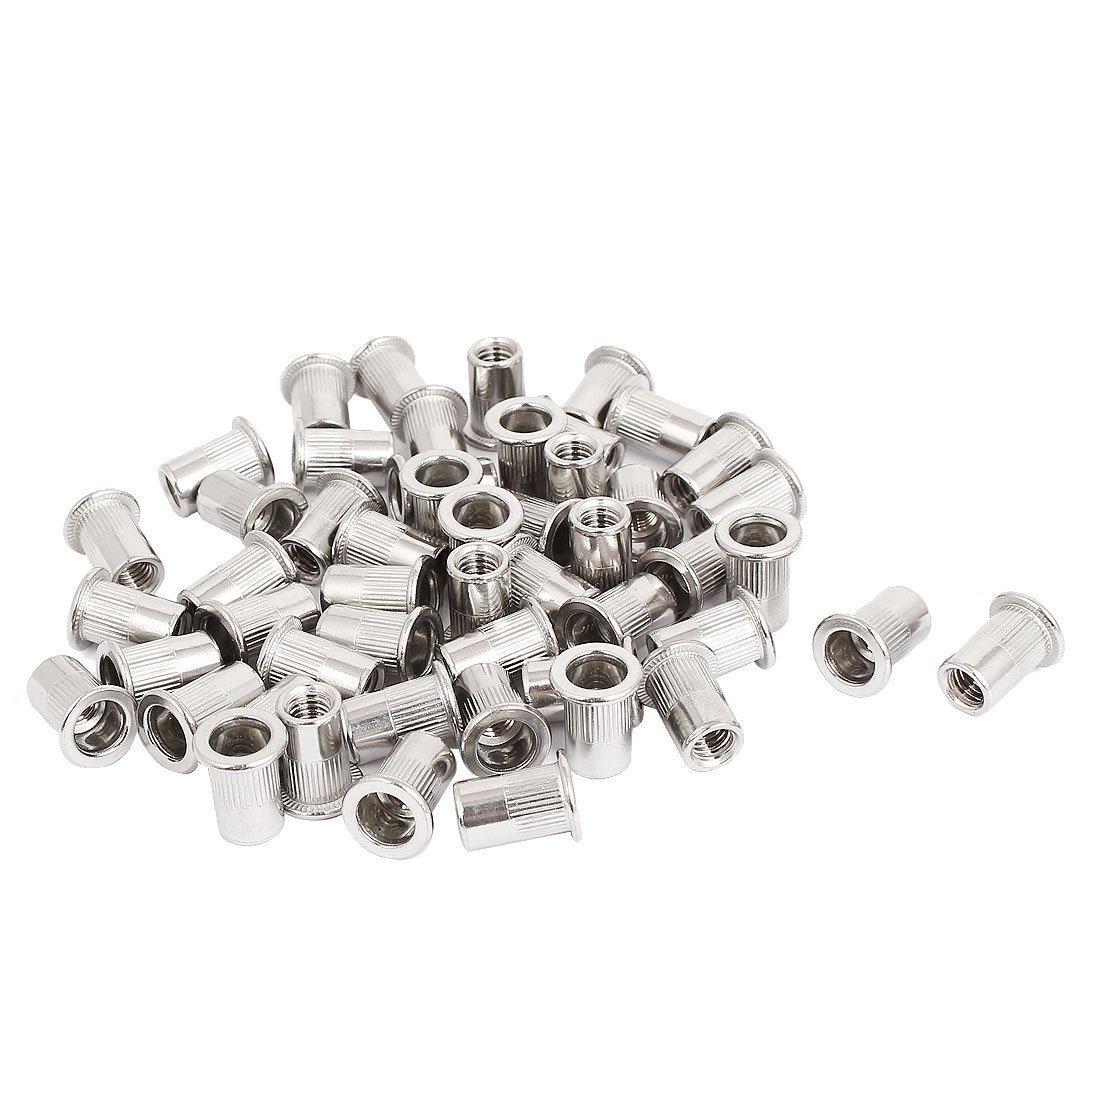 M8 Thread 304 Stainless Steel Rivet Nut Rivnut Insert Nutsert 30pcs HARDWARE WORLD